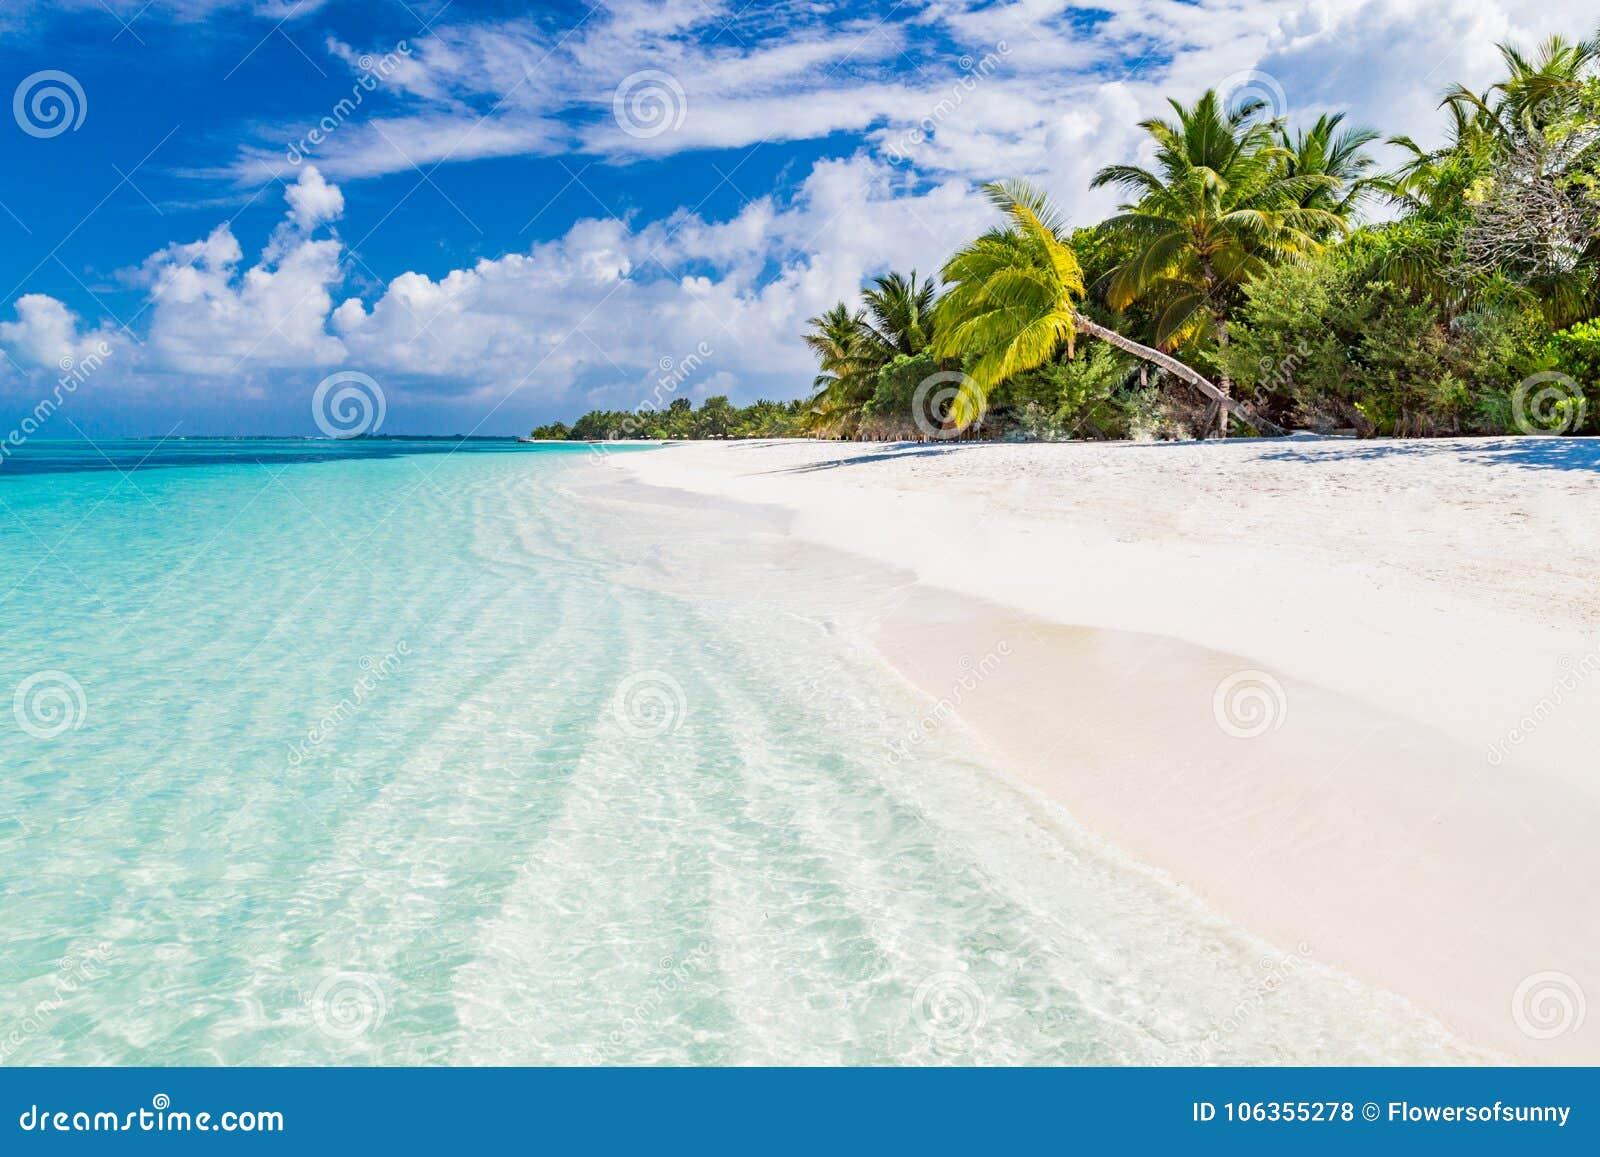 Maldives Beach Landscape For Background Or Wallpaper Design